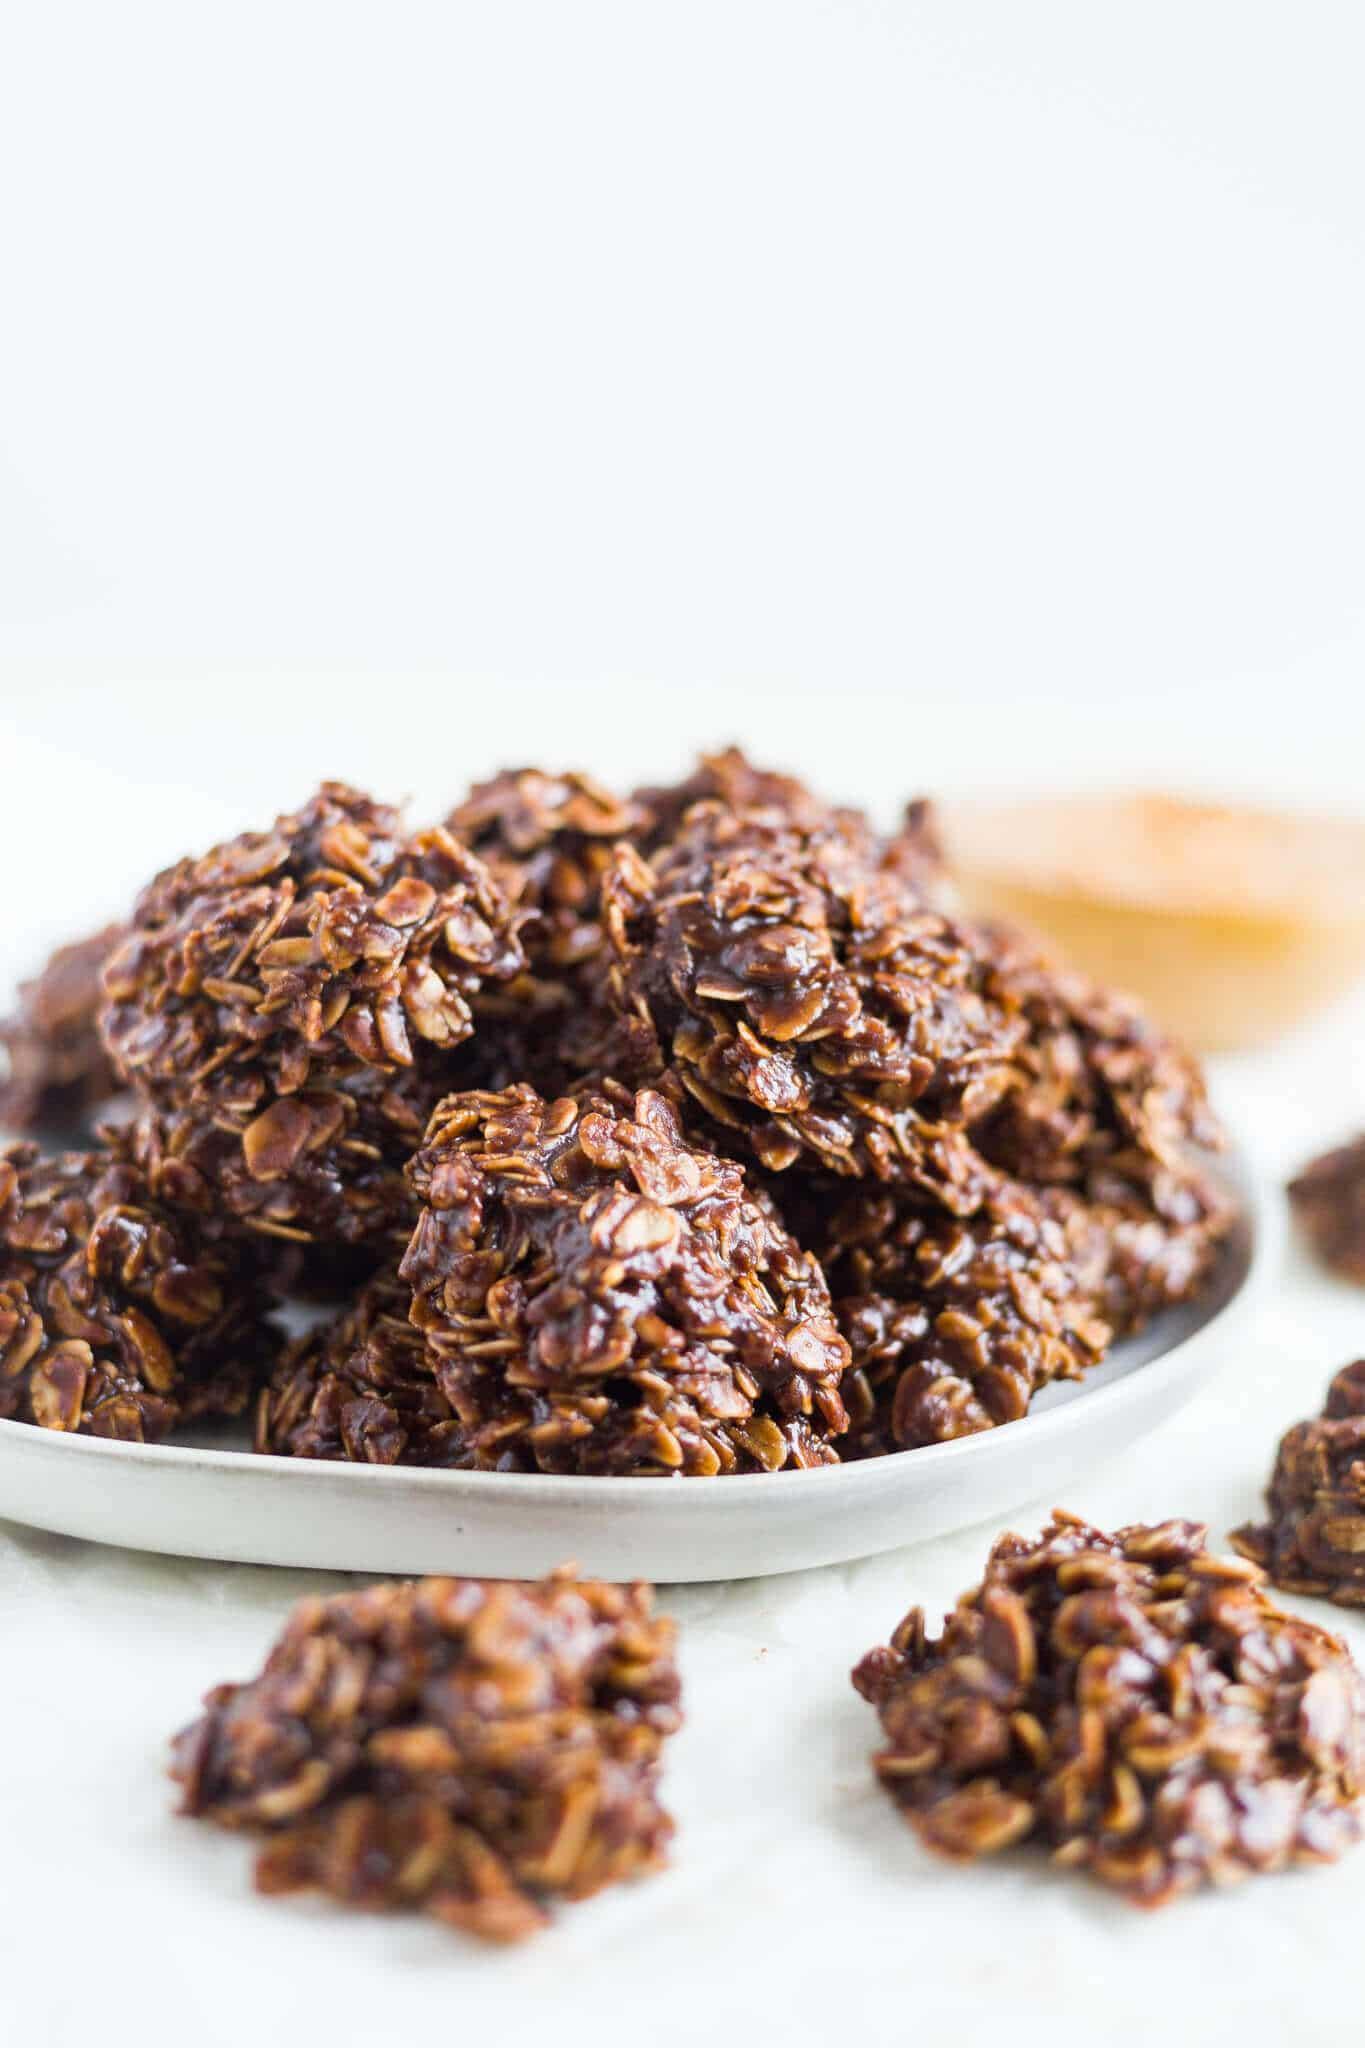 recipe for no bake chocolate oatmeal cookies